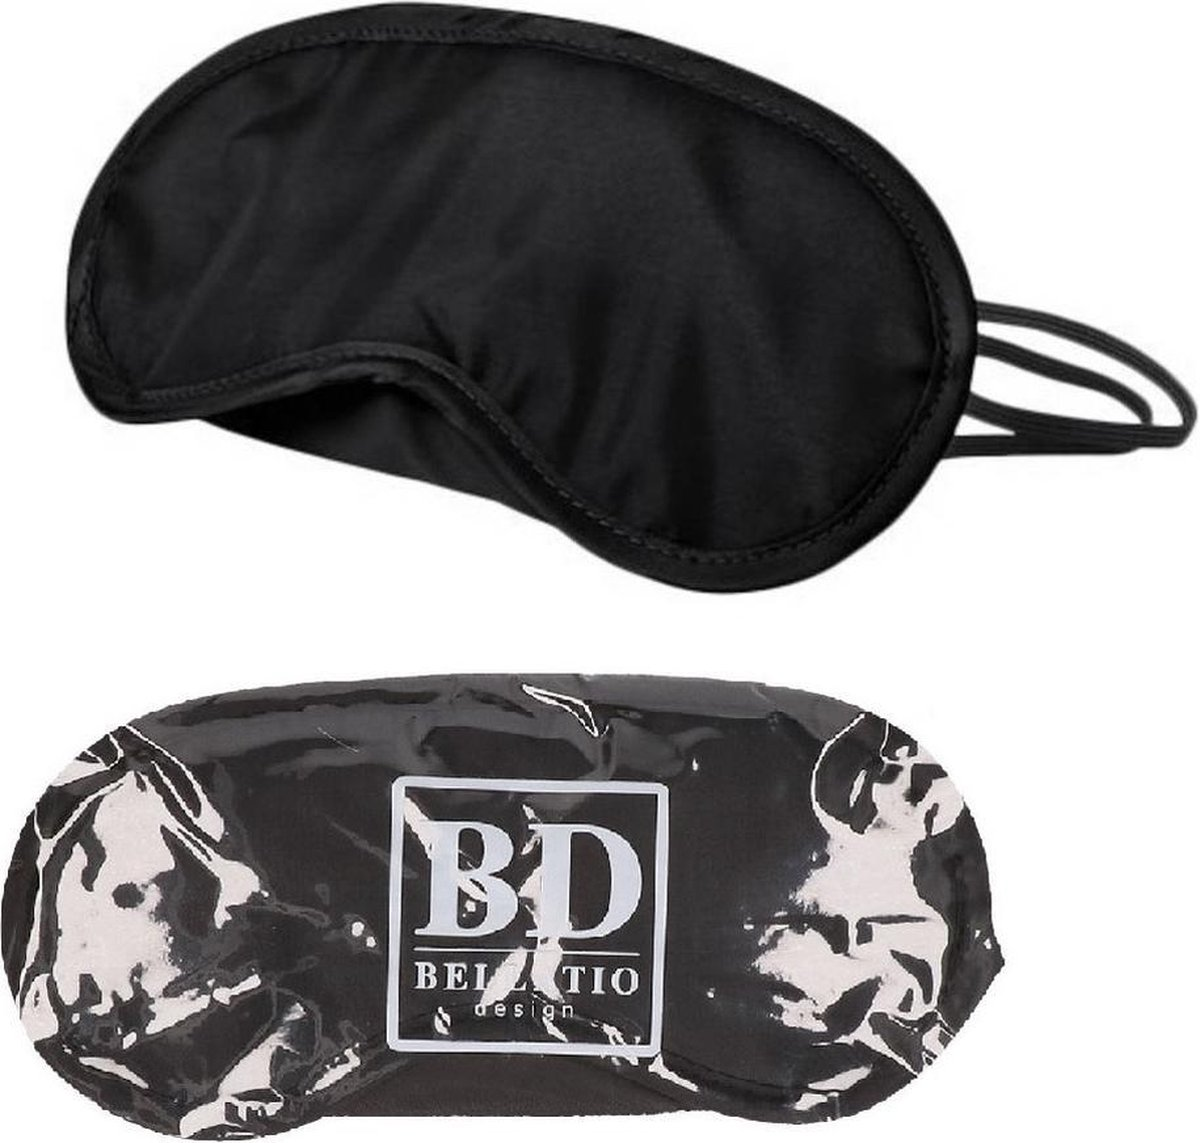 Slaapmasker zwart 2 stuks